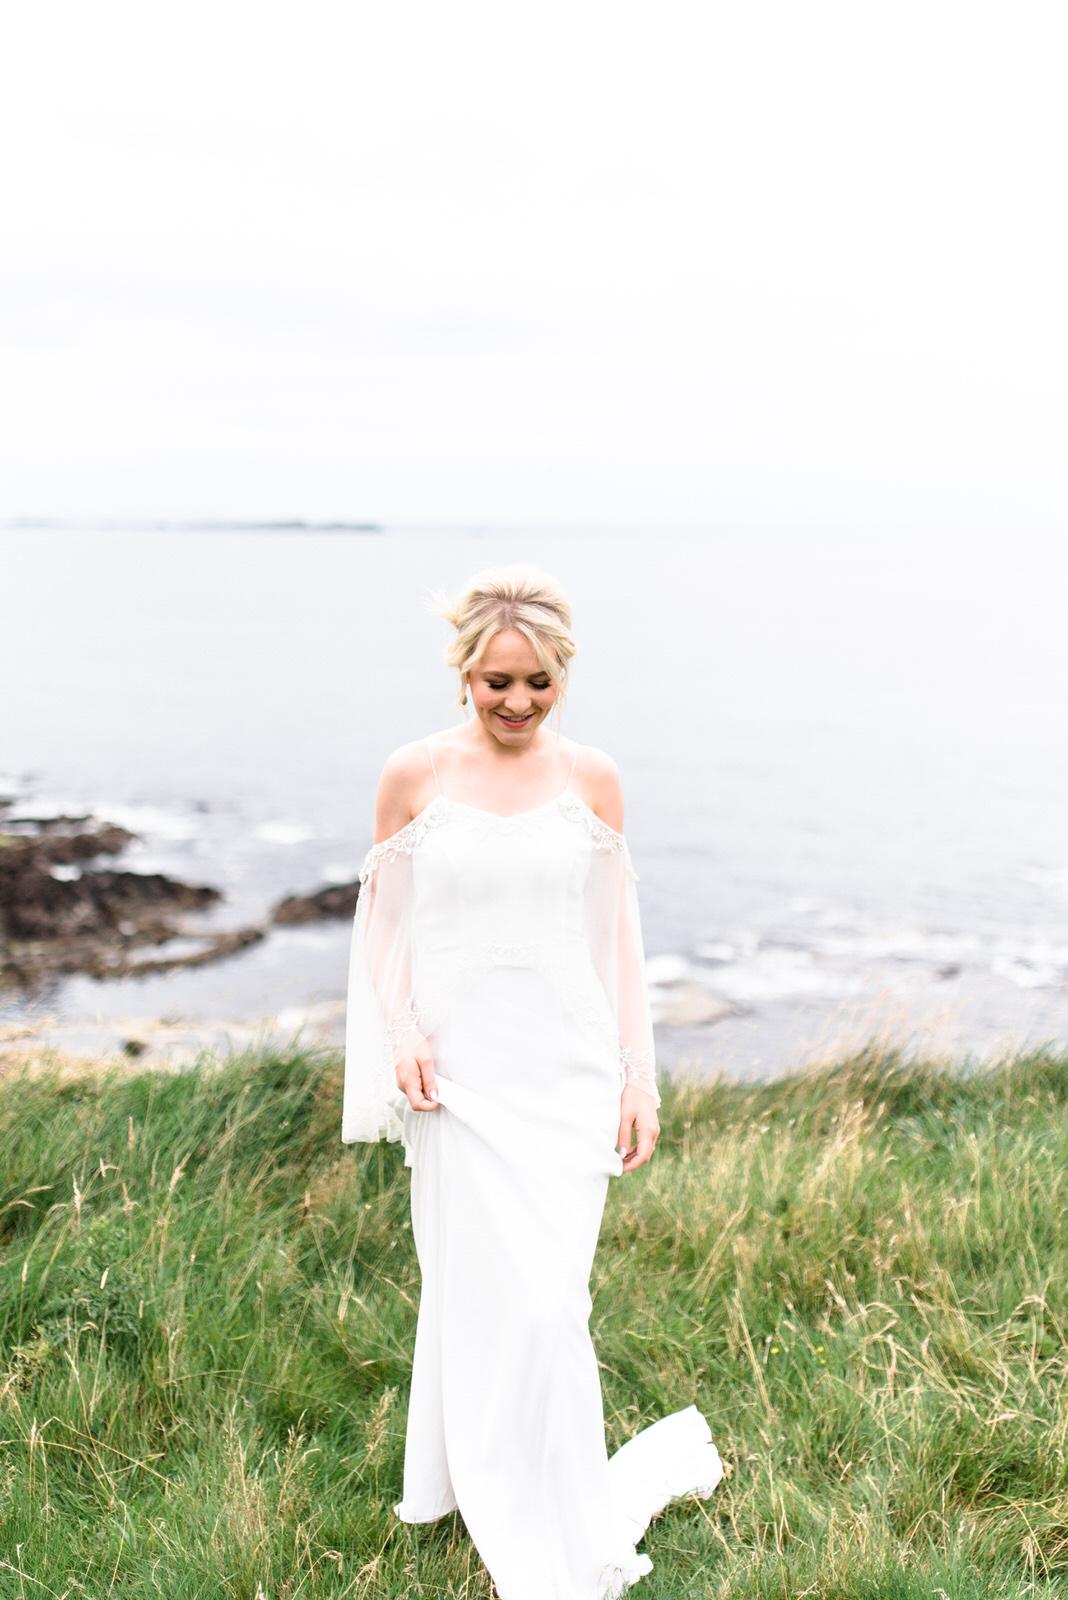 fine art dunluce castle elopement in ireland in sage and white, cliff of northern ireland, bo and luca wedding dress, irish wedding-1.jpg